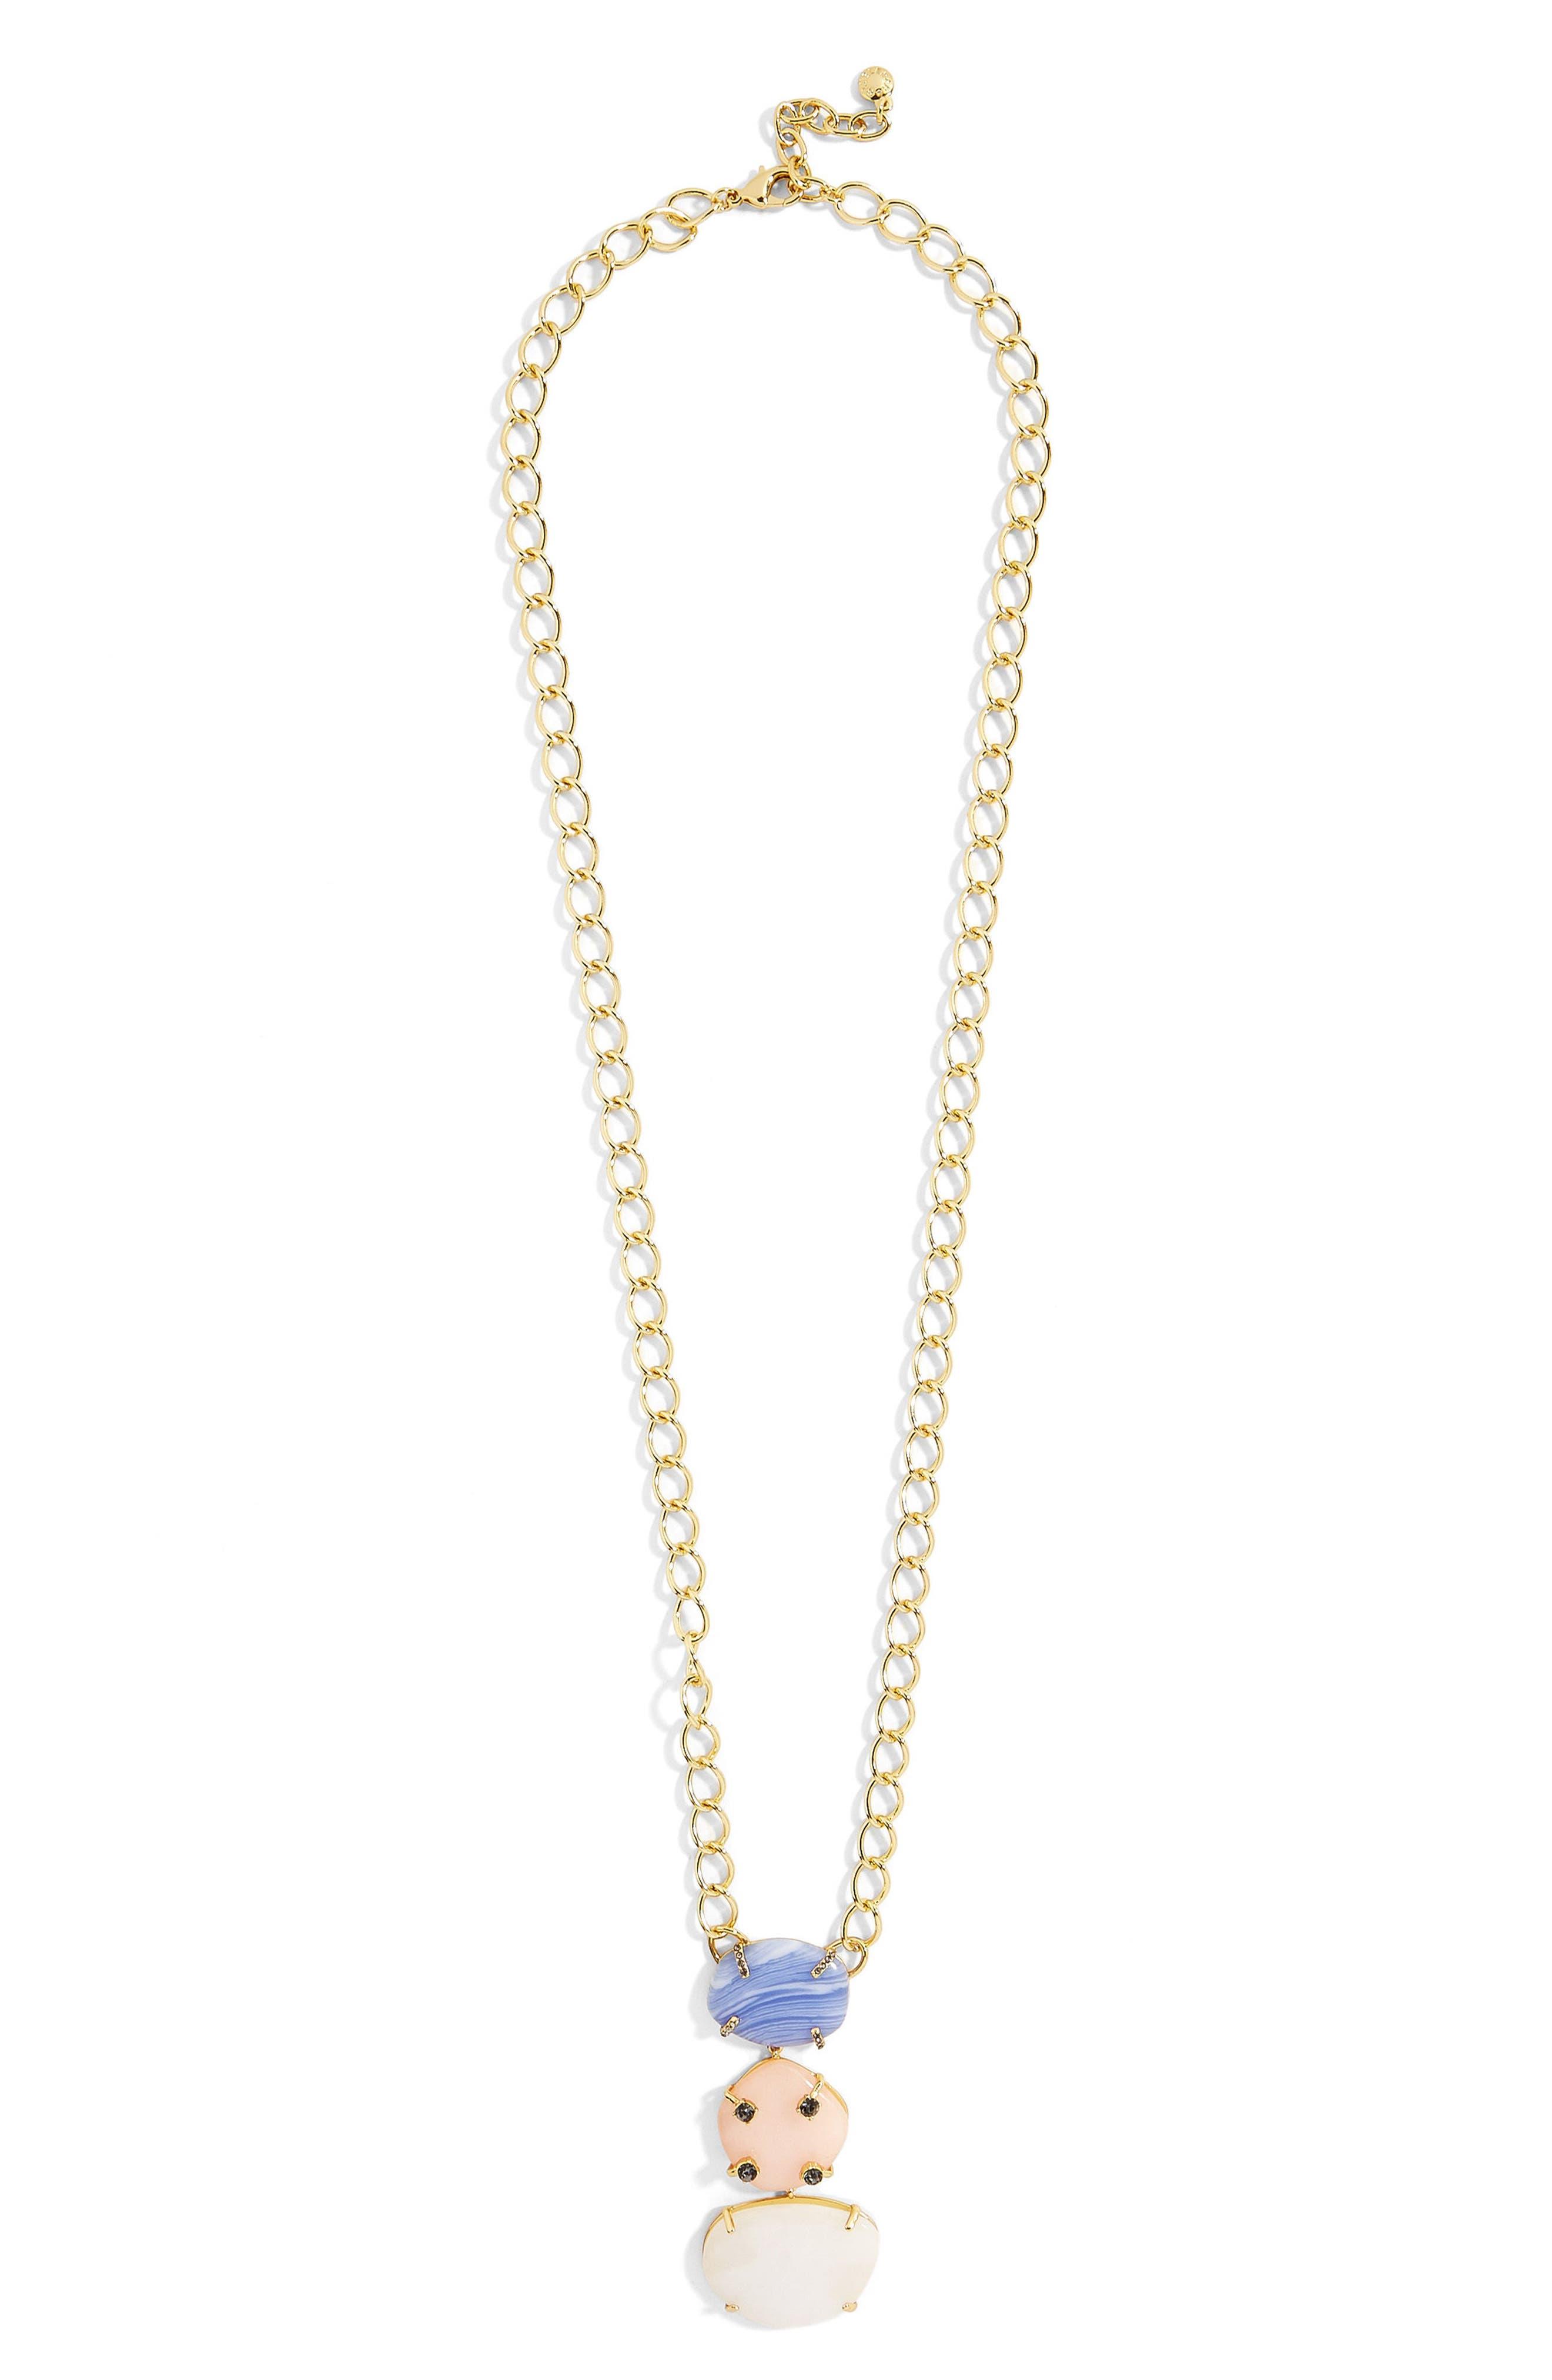 Main Image - BaubleBar Karmah Pendant Necklace